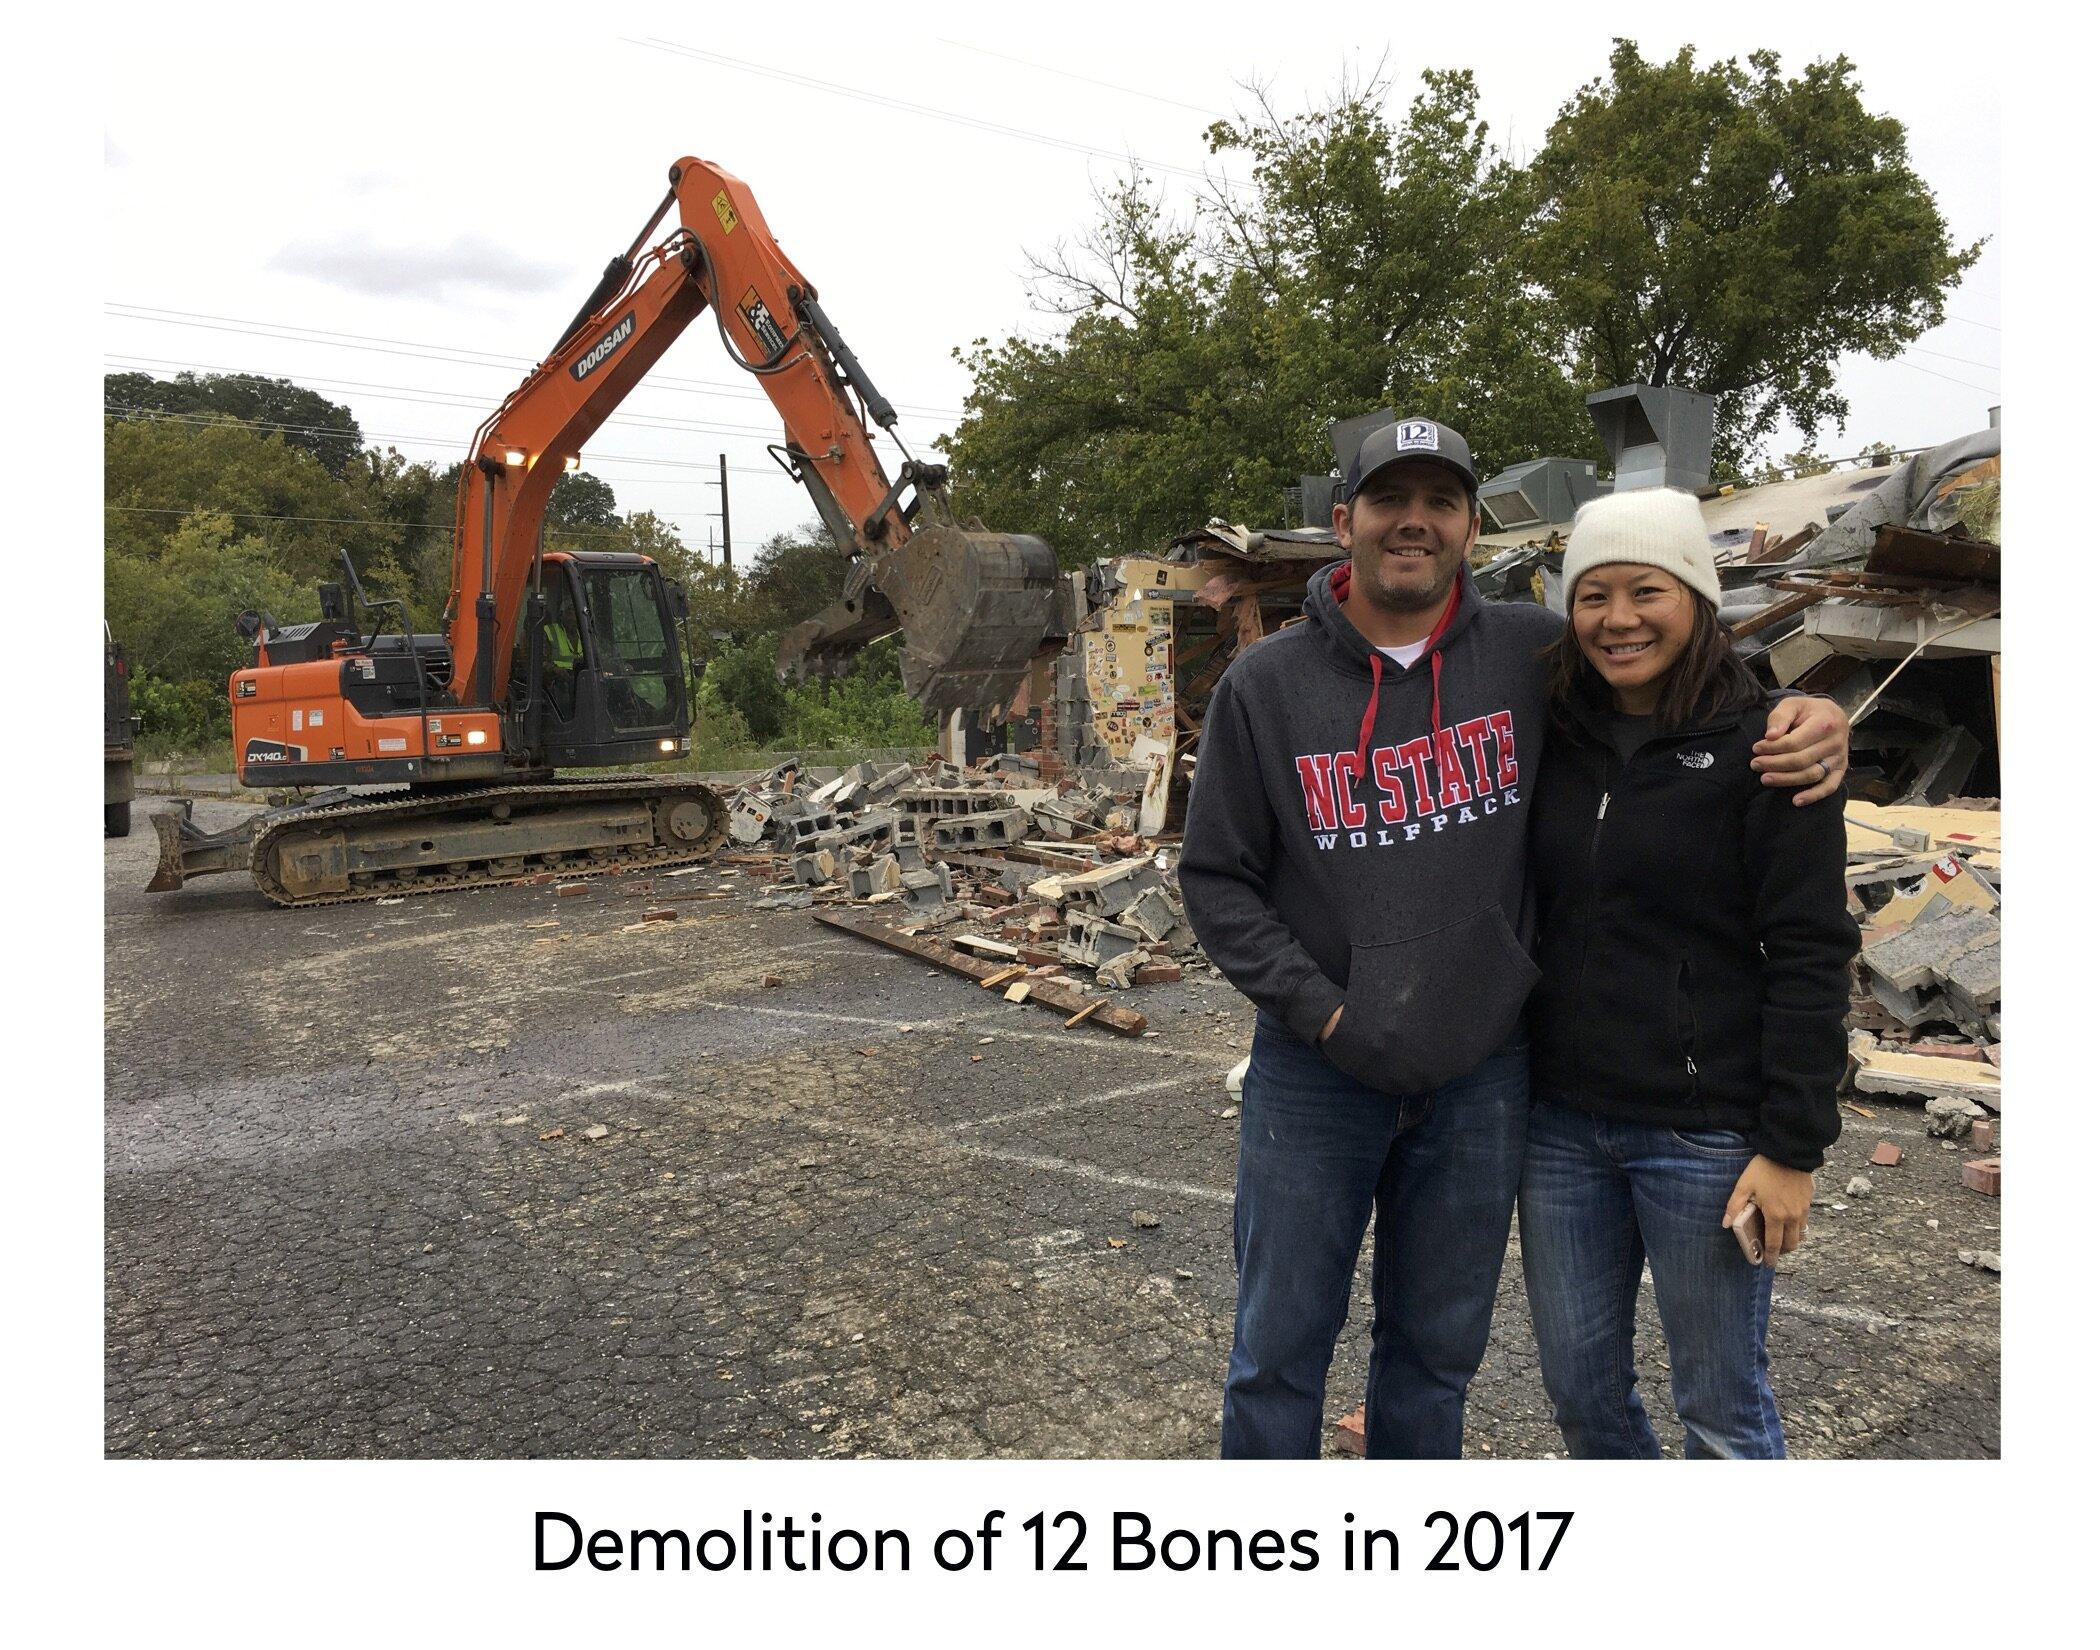 12 bones demolition 2017.jpg